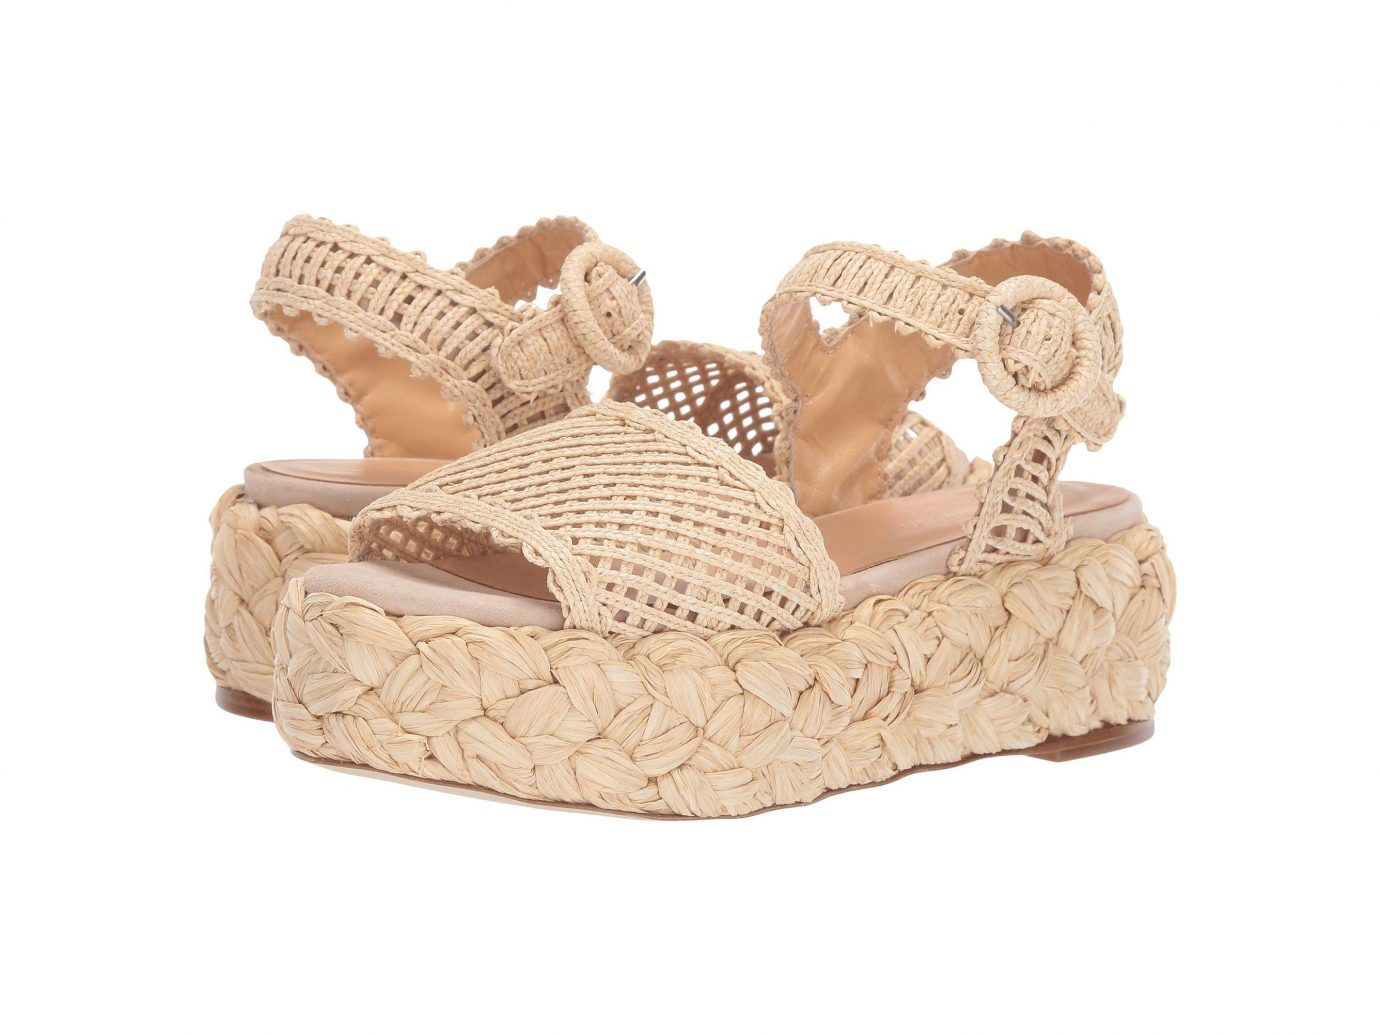 Paloma Barcelo Oda Sandals